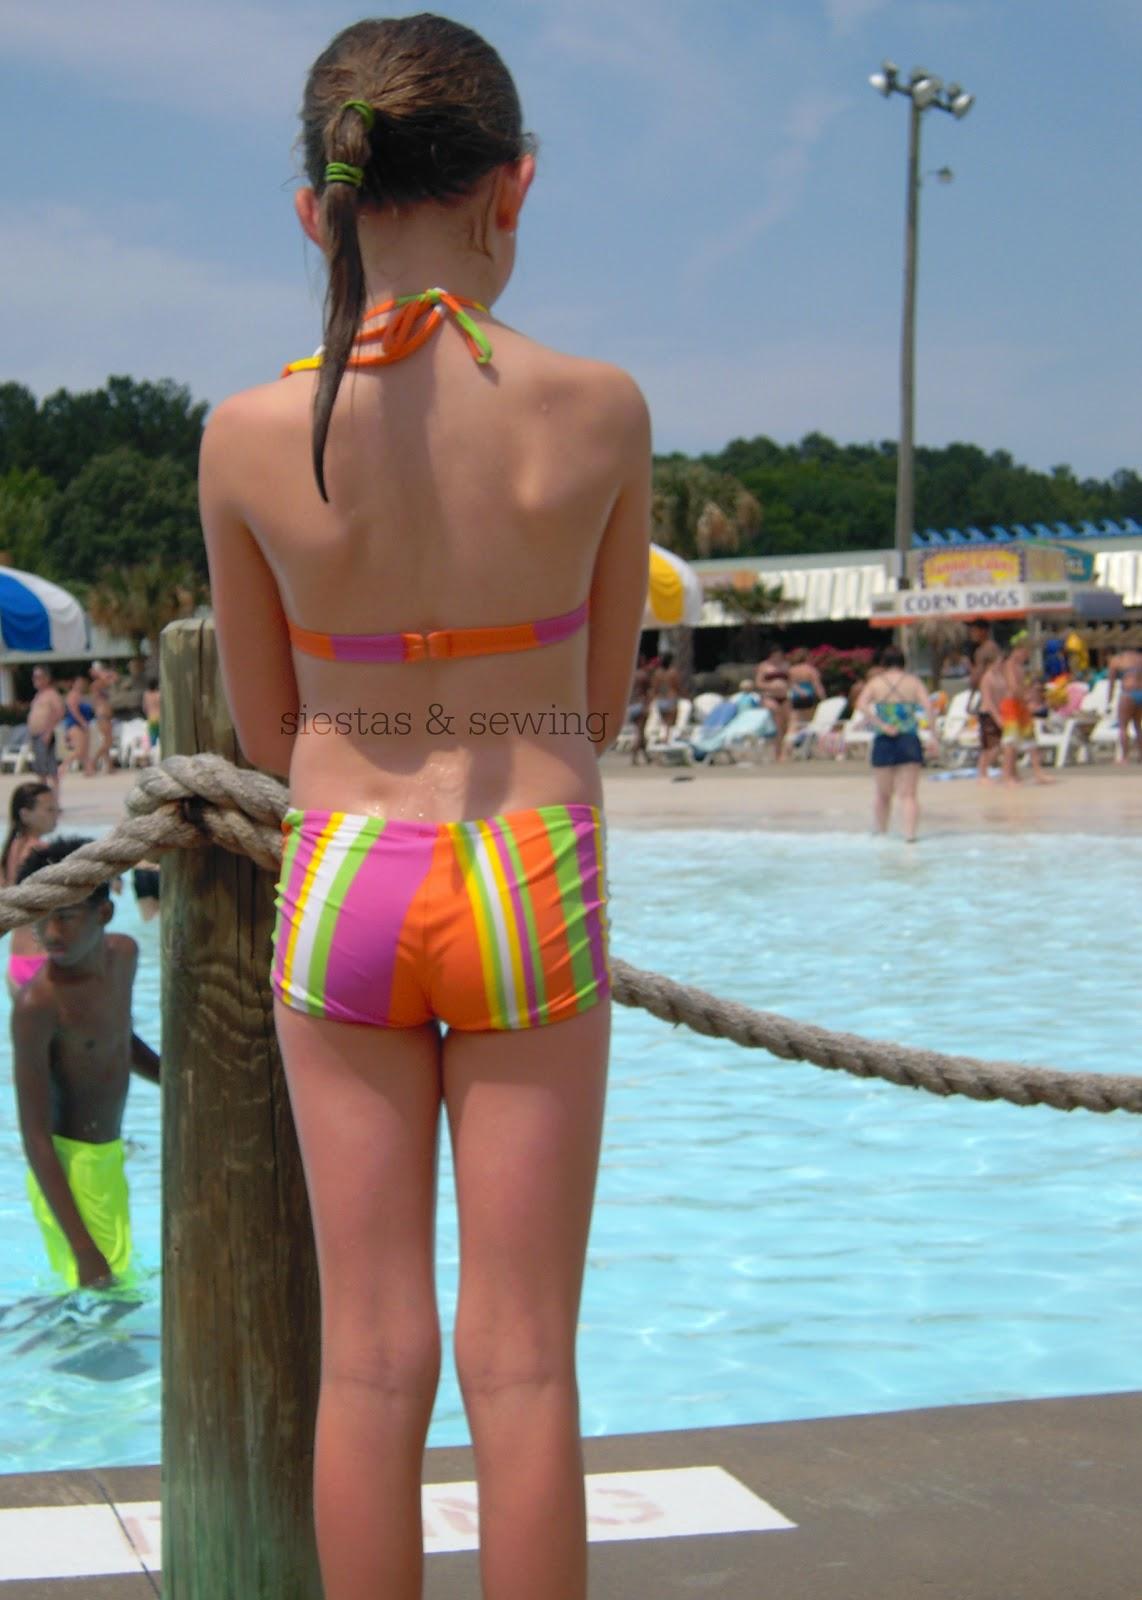 chose a bikini with boy shorts and BK chose a one piece with a skirt. stitchtalk.com.